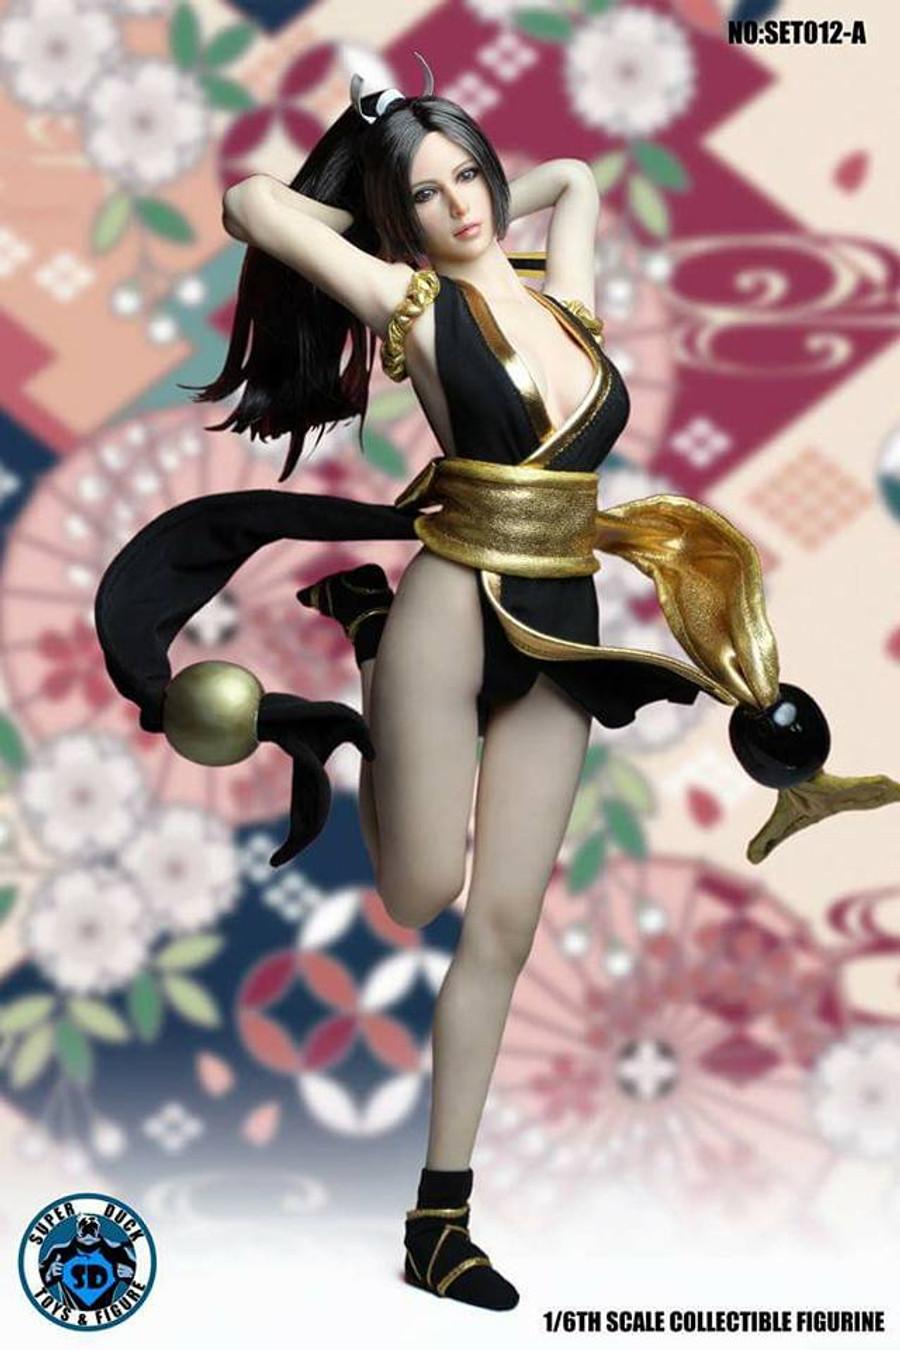 Super Duck - Cosplay Series: Fighting Girl